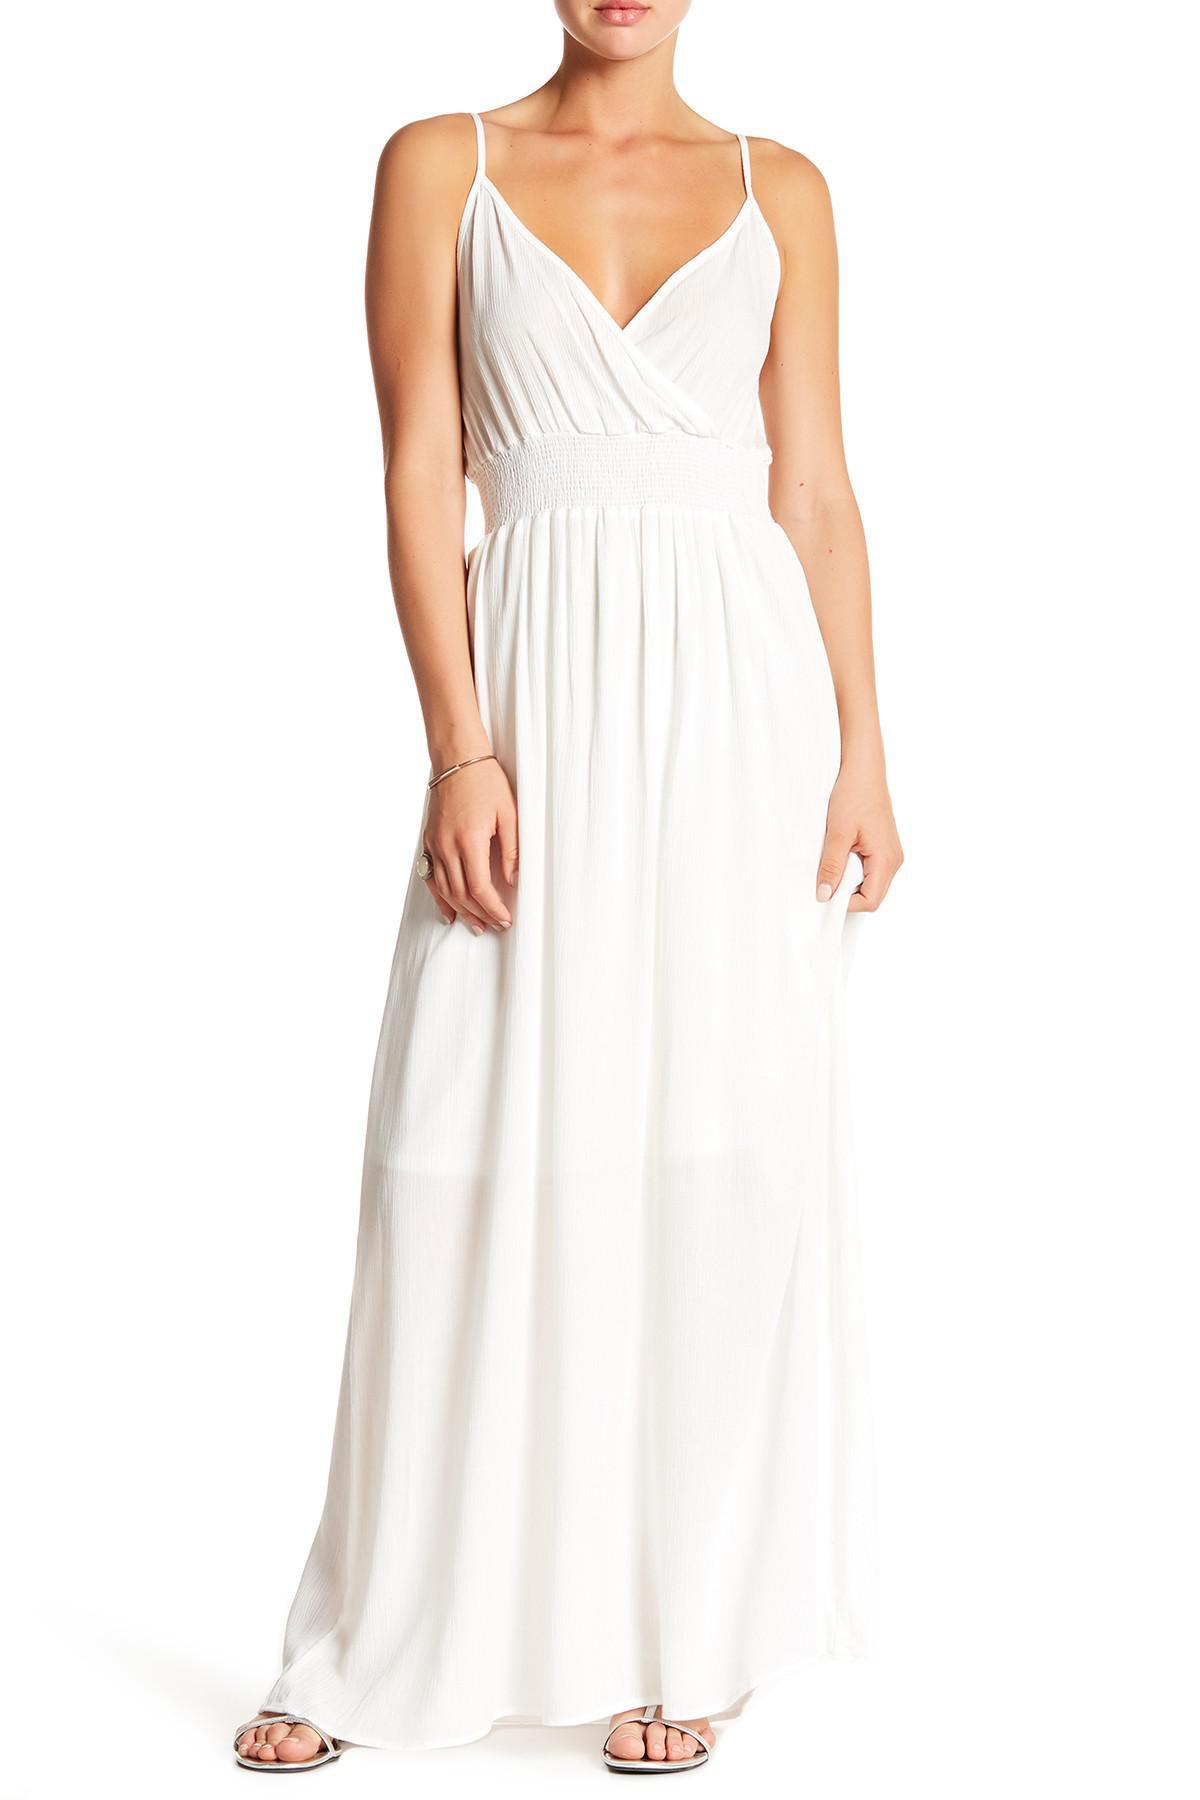 781ed74ce6a West Kei Gauze Maxi Dress in White - Lyst